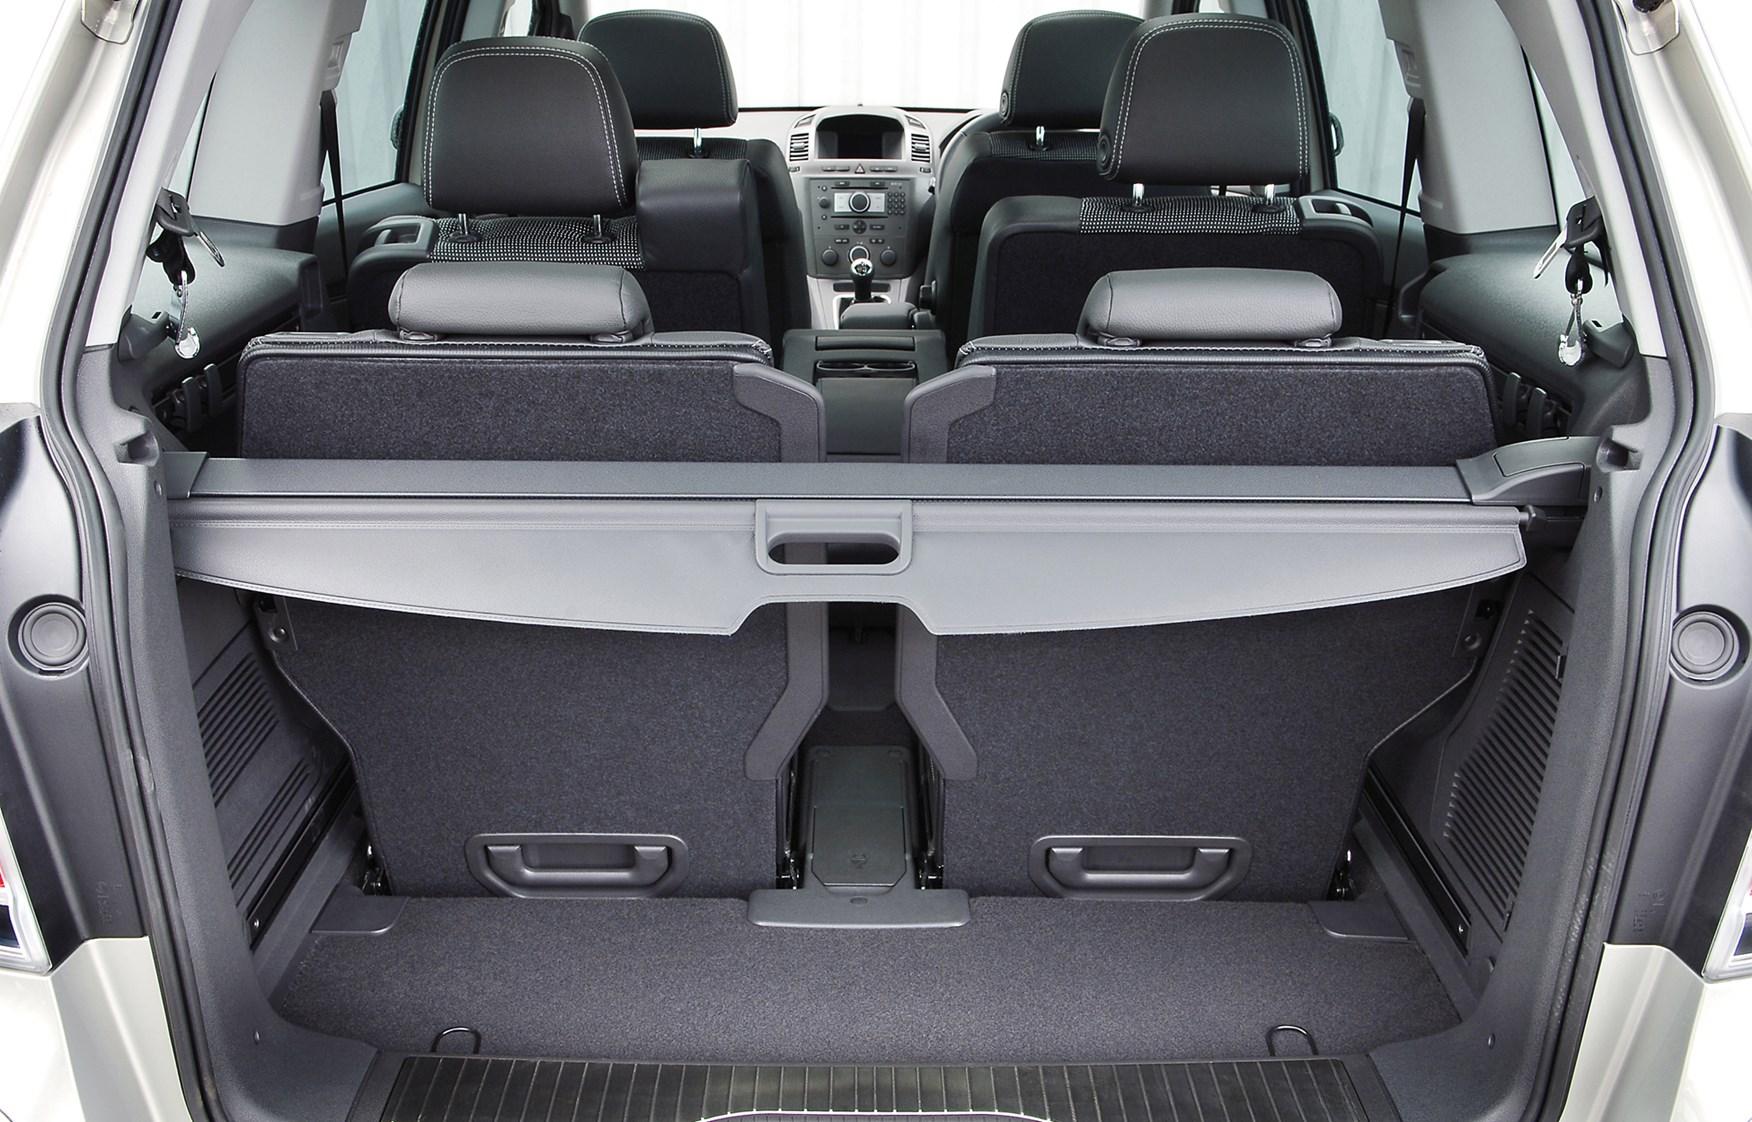 Opel zafira boot space